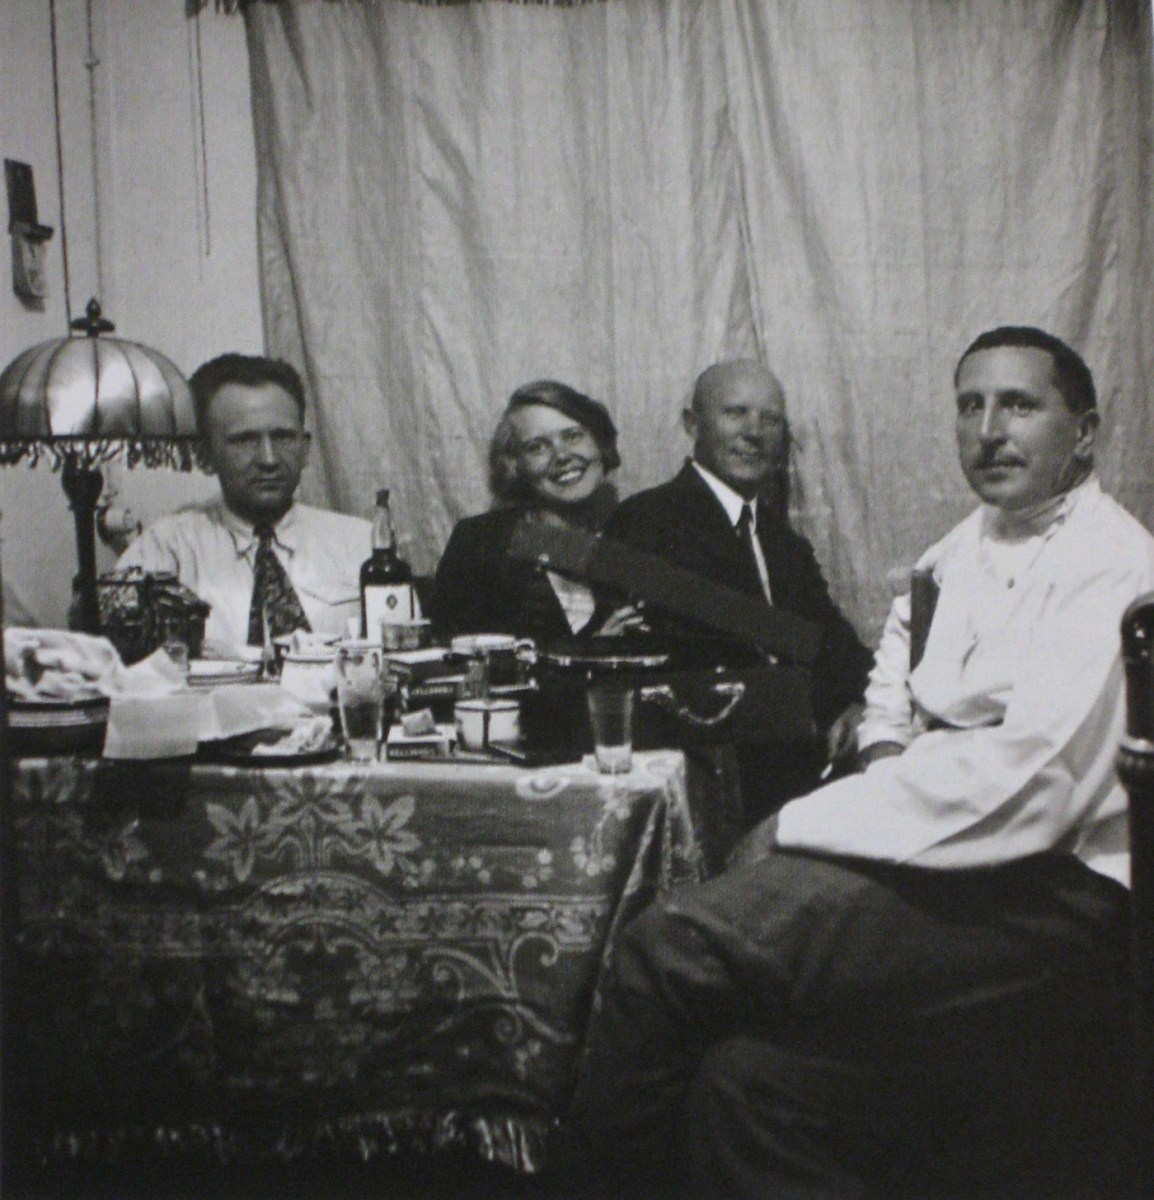 Wilhelm Hauss, Jekaterina Nikolaevna, Frolov, and Ernst May, Magnitogorsk circa 1931)